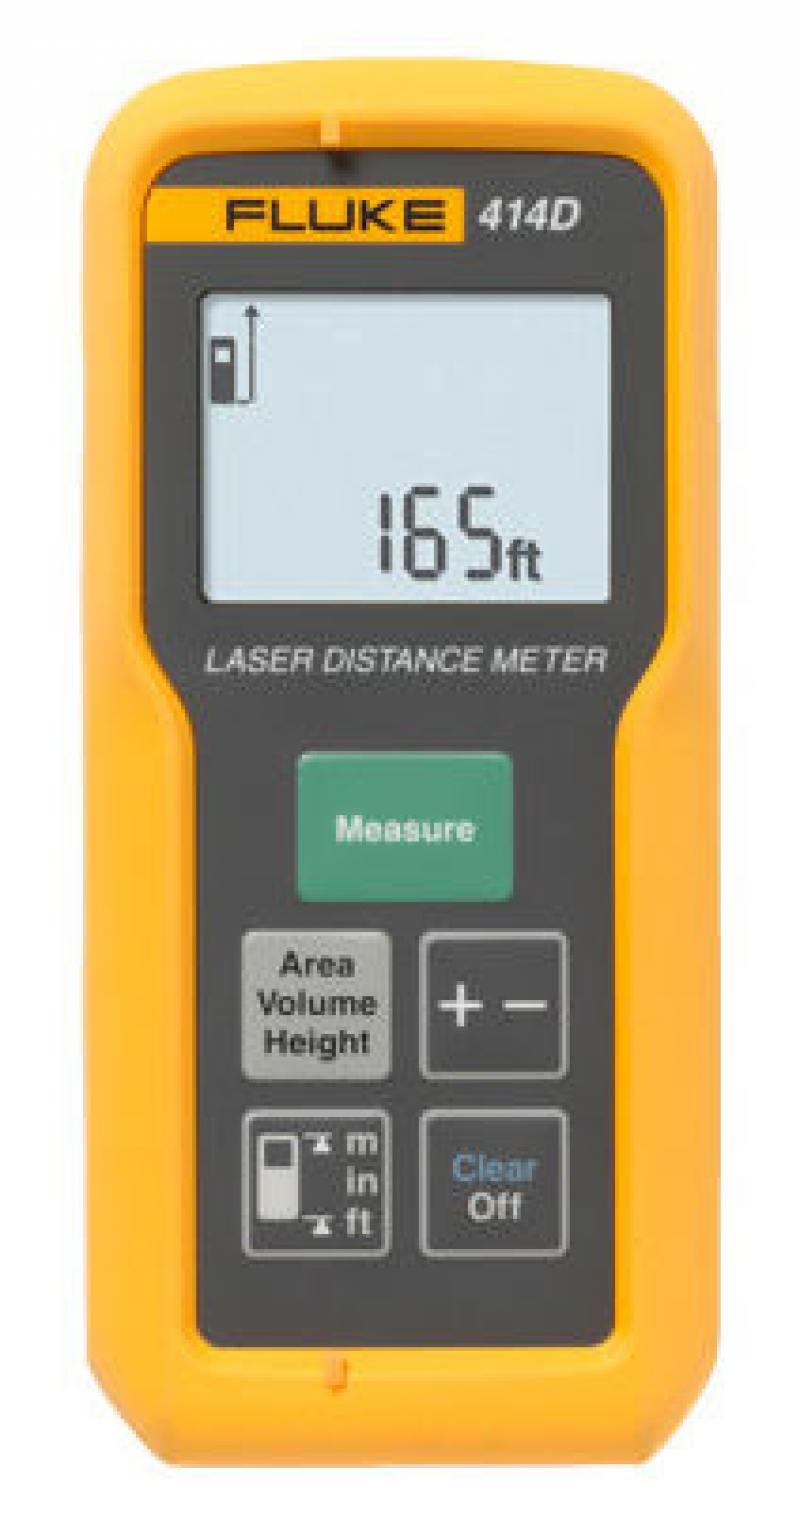 Дальномер Fluke IG FLUKE-414D лазерный дальномер fluke 419d